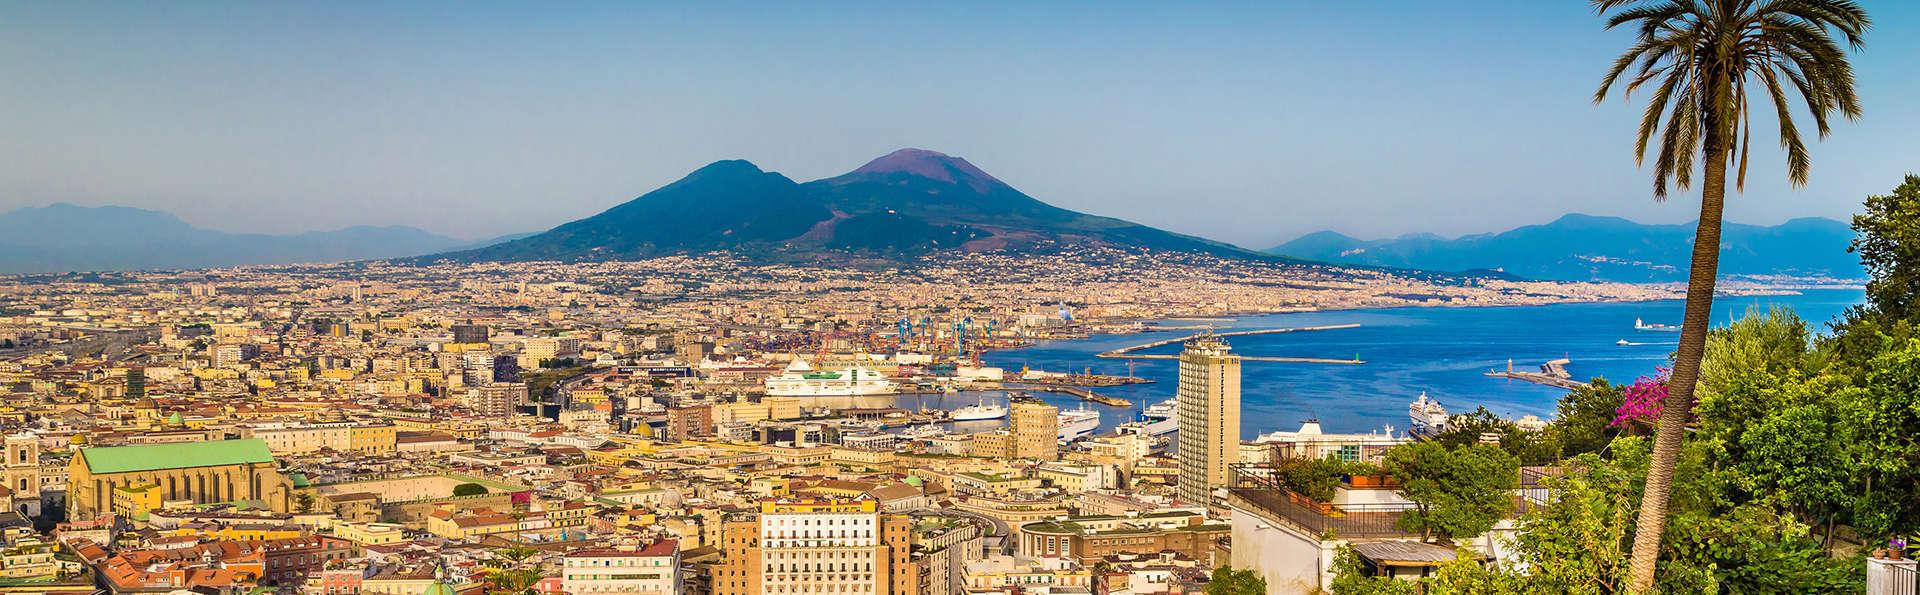 Napoli Suite - edit_shutterstock_217167658_napoli.jpg